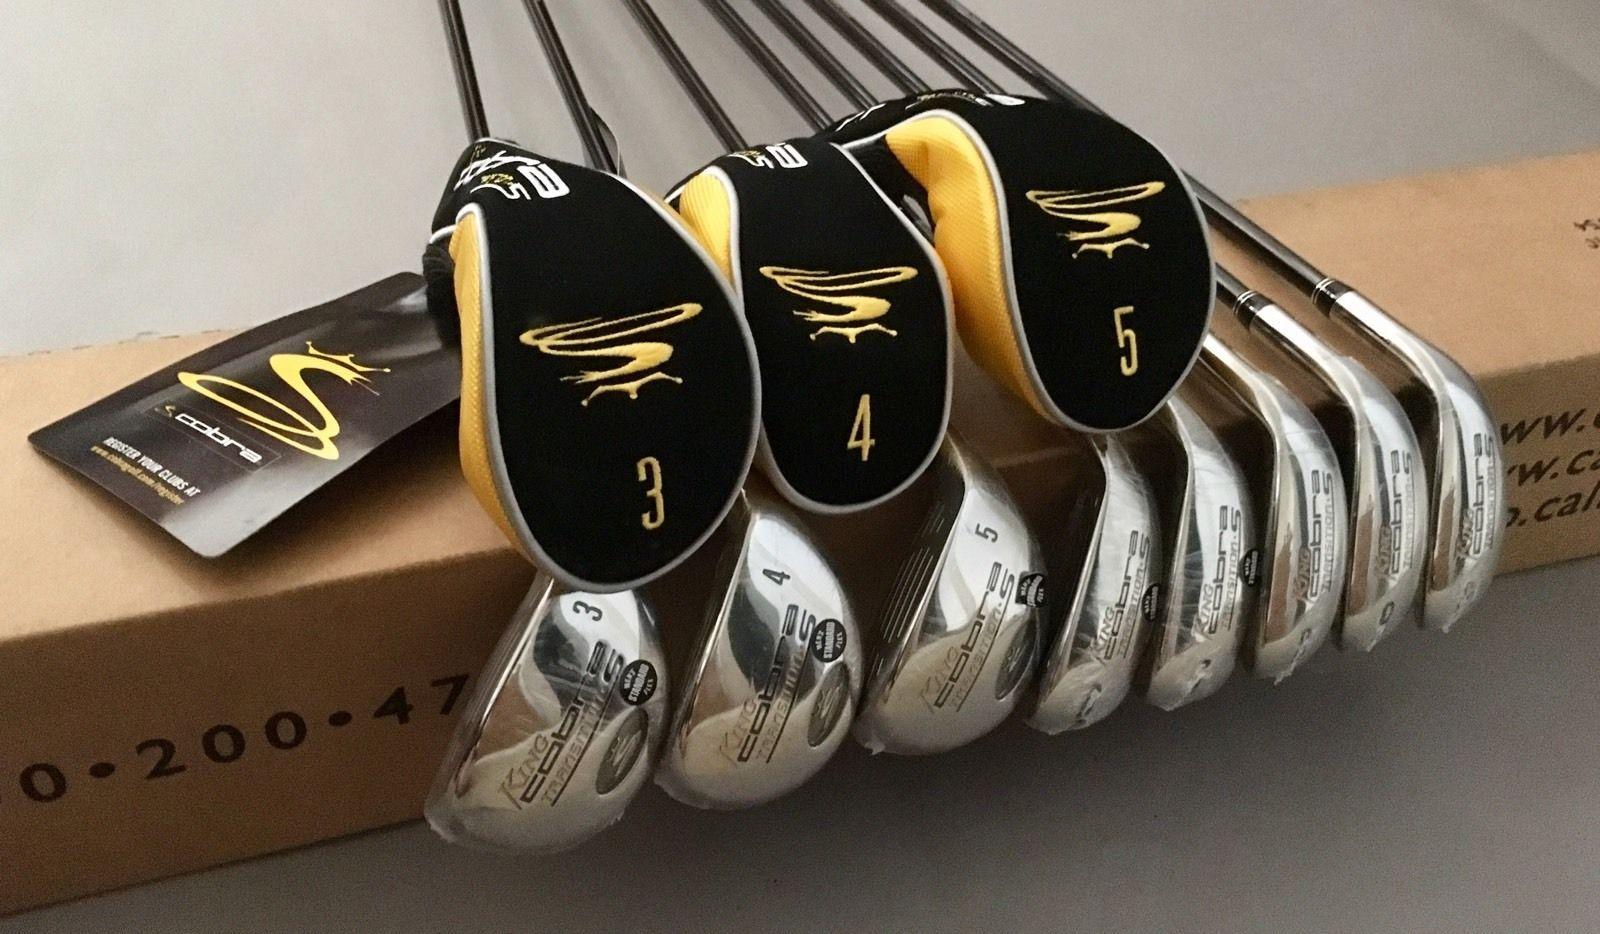 New King Cobra Transition S Irons 3-PW 65g Standard Flex Graphite Golf Club Set